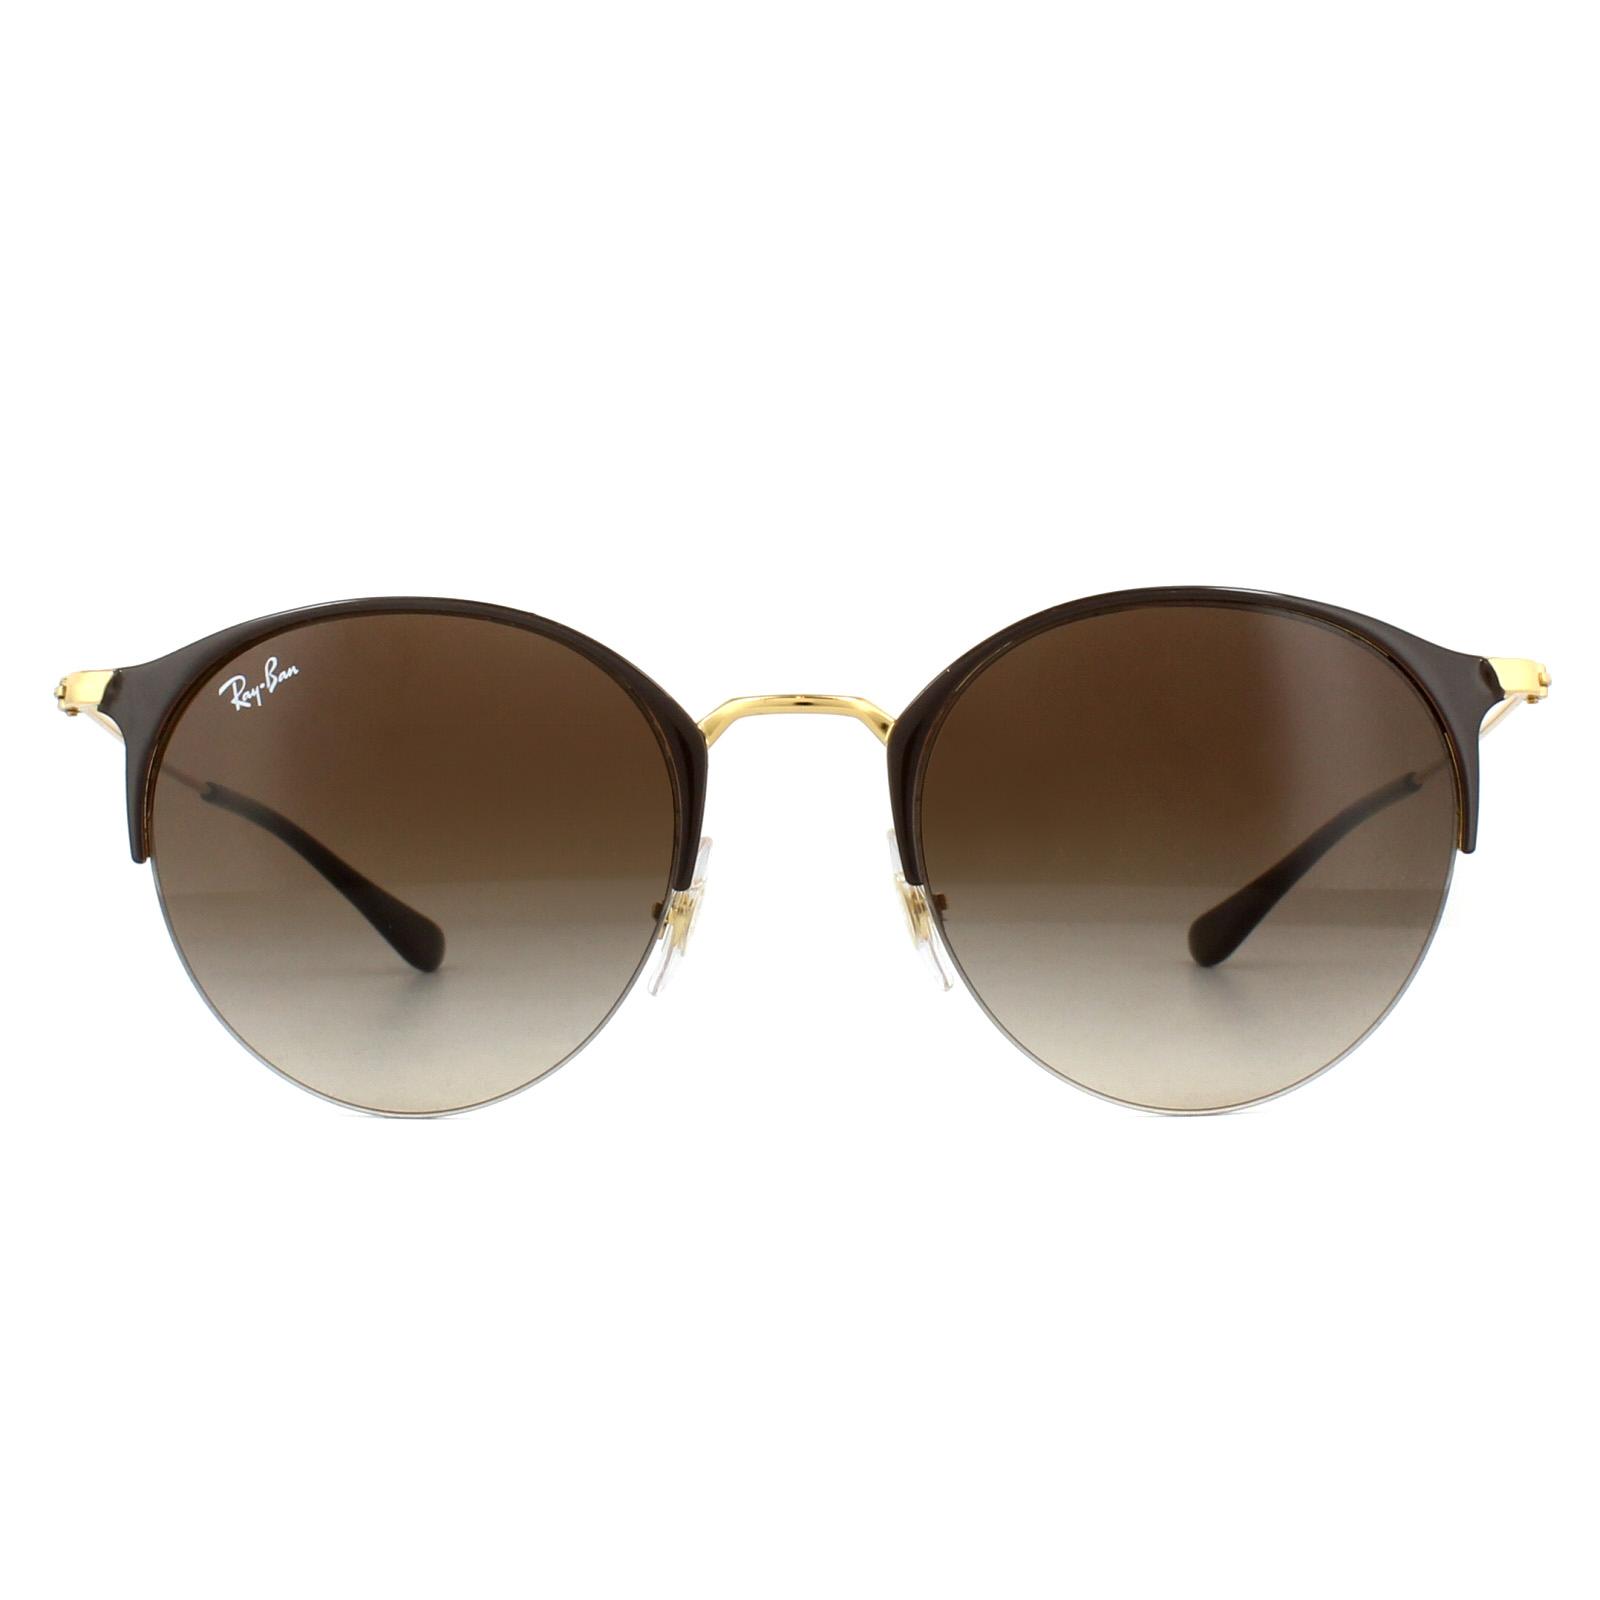 bc2b7a1702e Sentinel Ray-Ban Sunglasses RB3578 900913 Brown Gold Brown Gradient